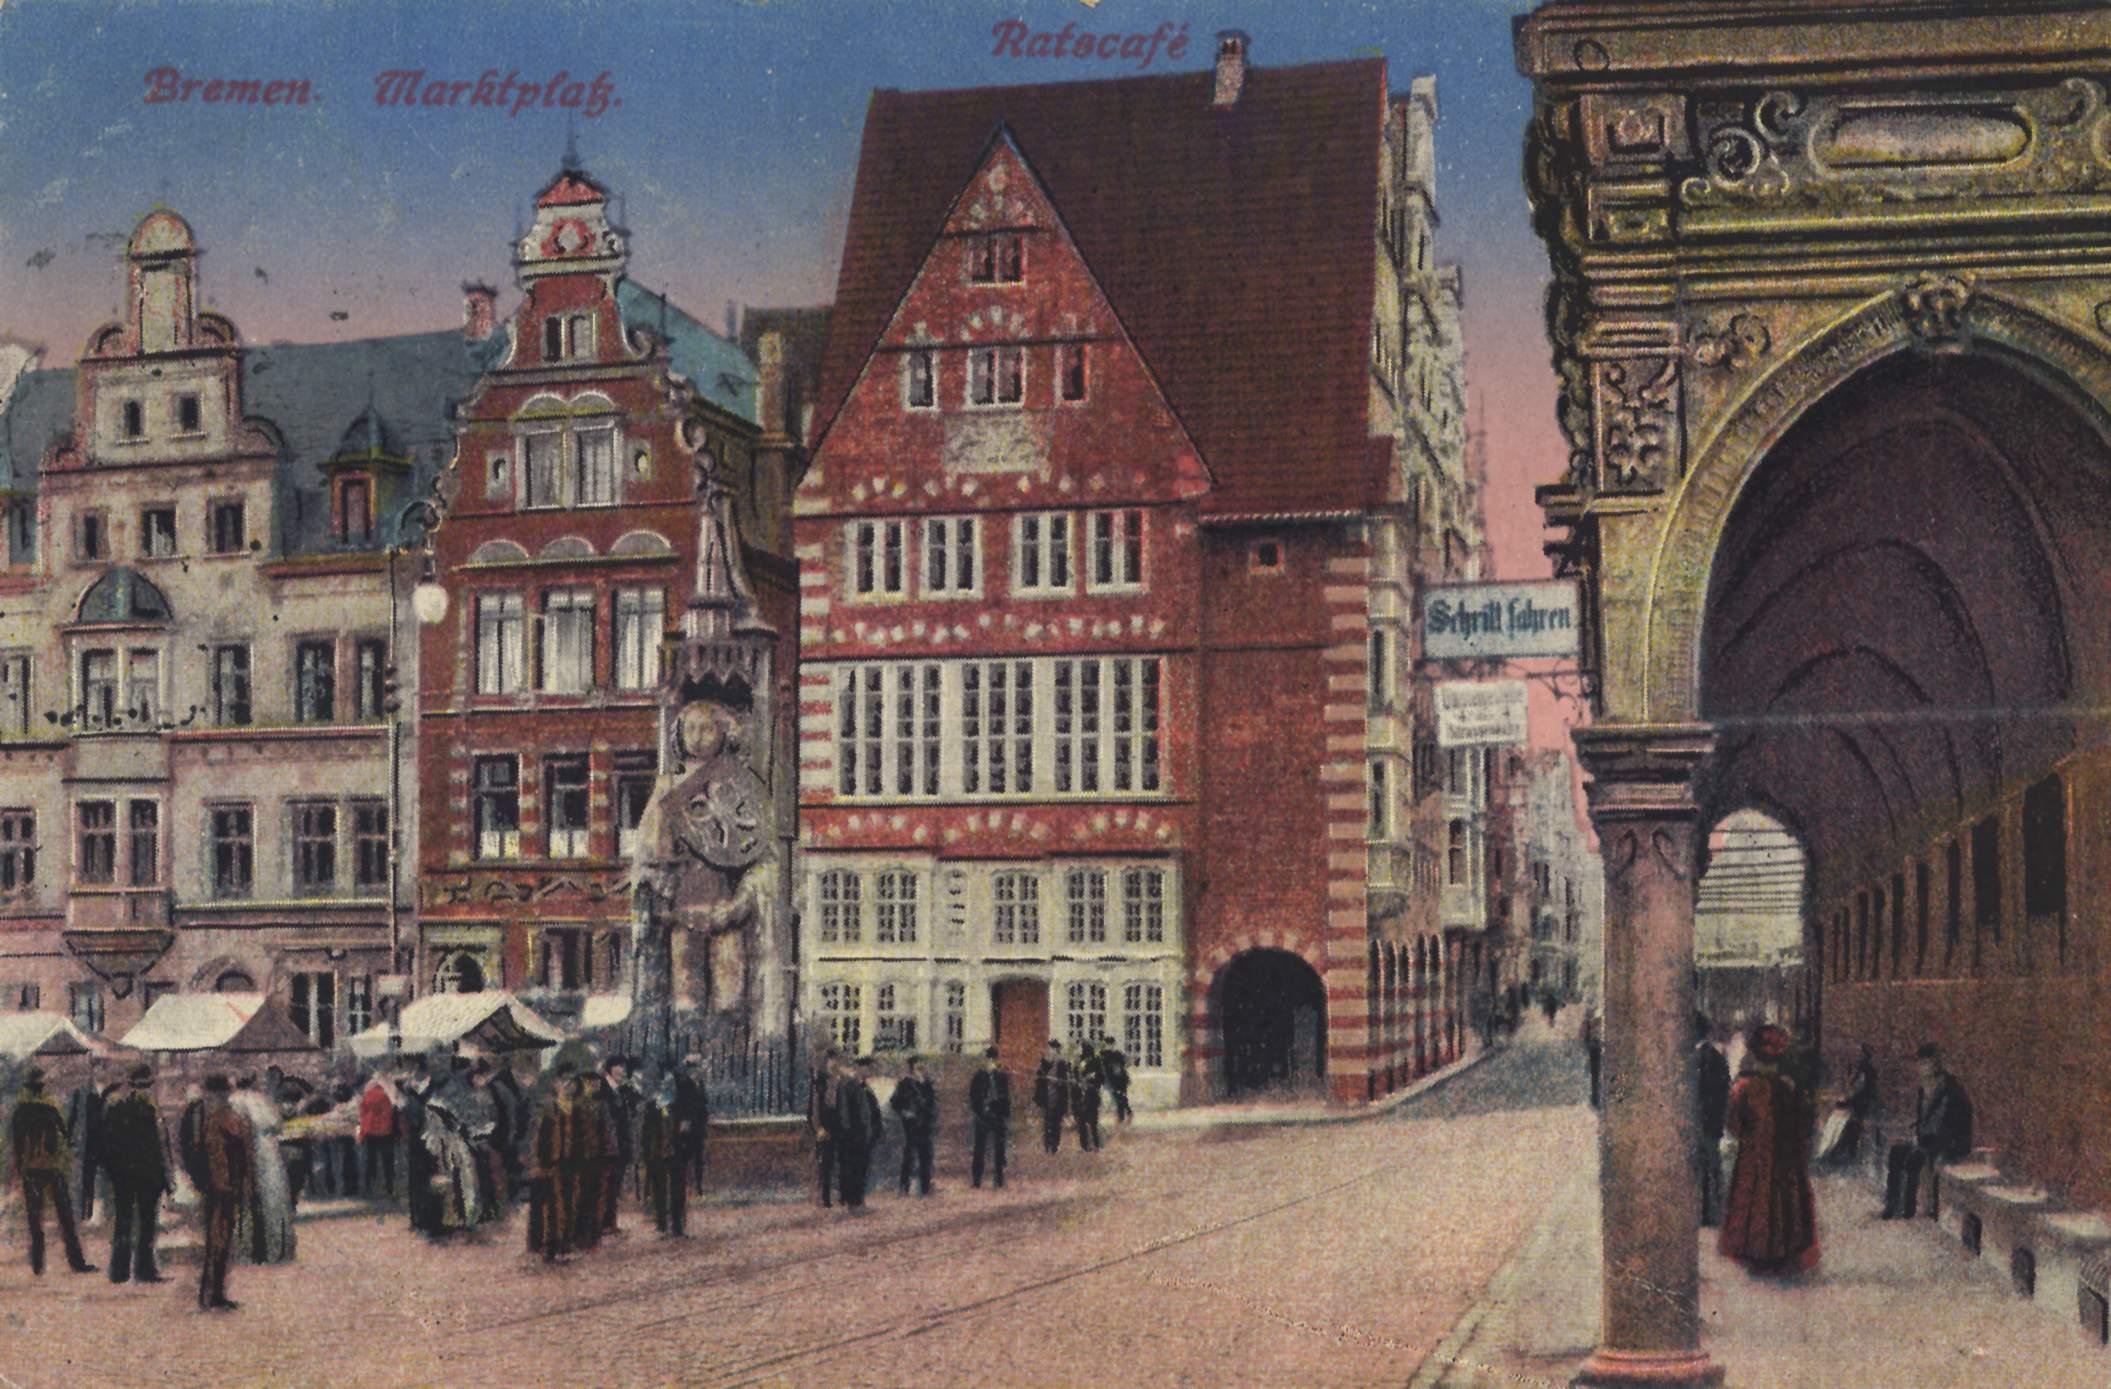 Innsbrucker Str Bremen